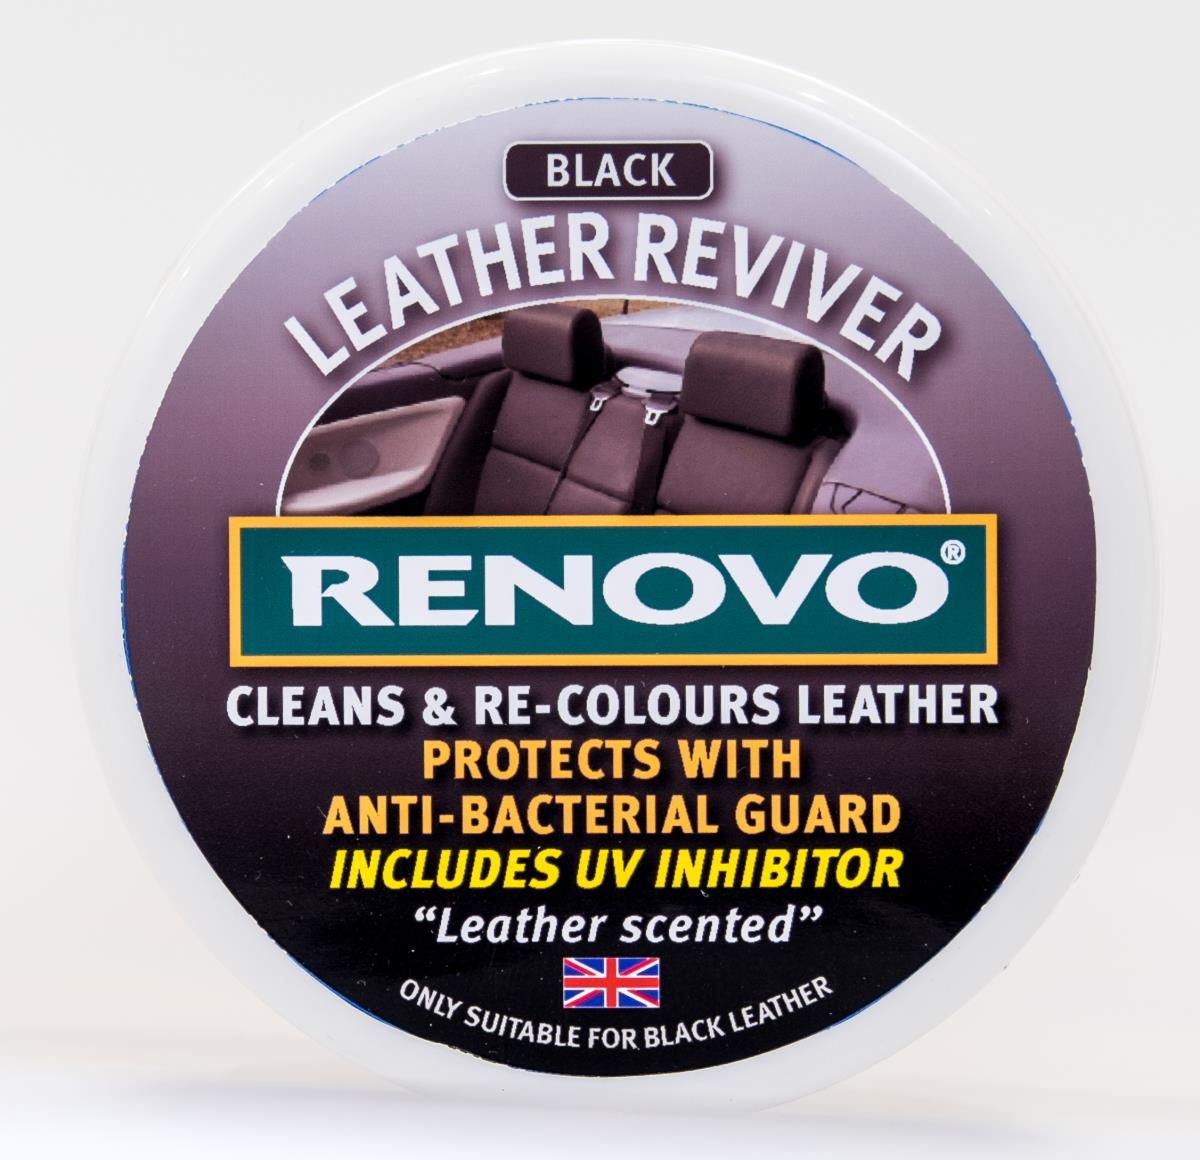 Renovo Leather Reviver (Black) 200ml